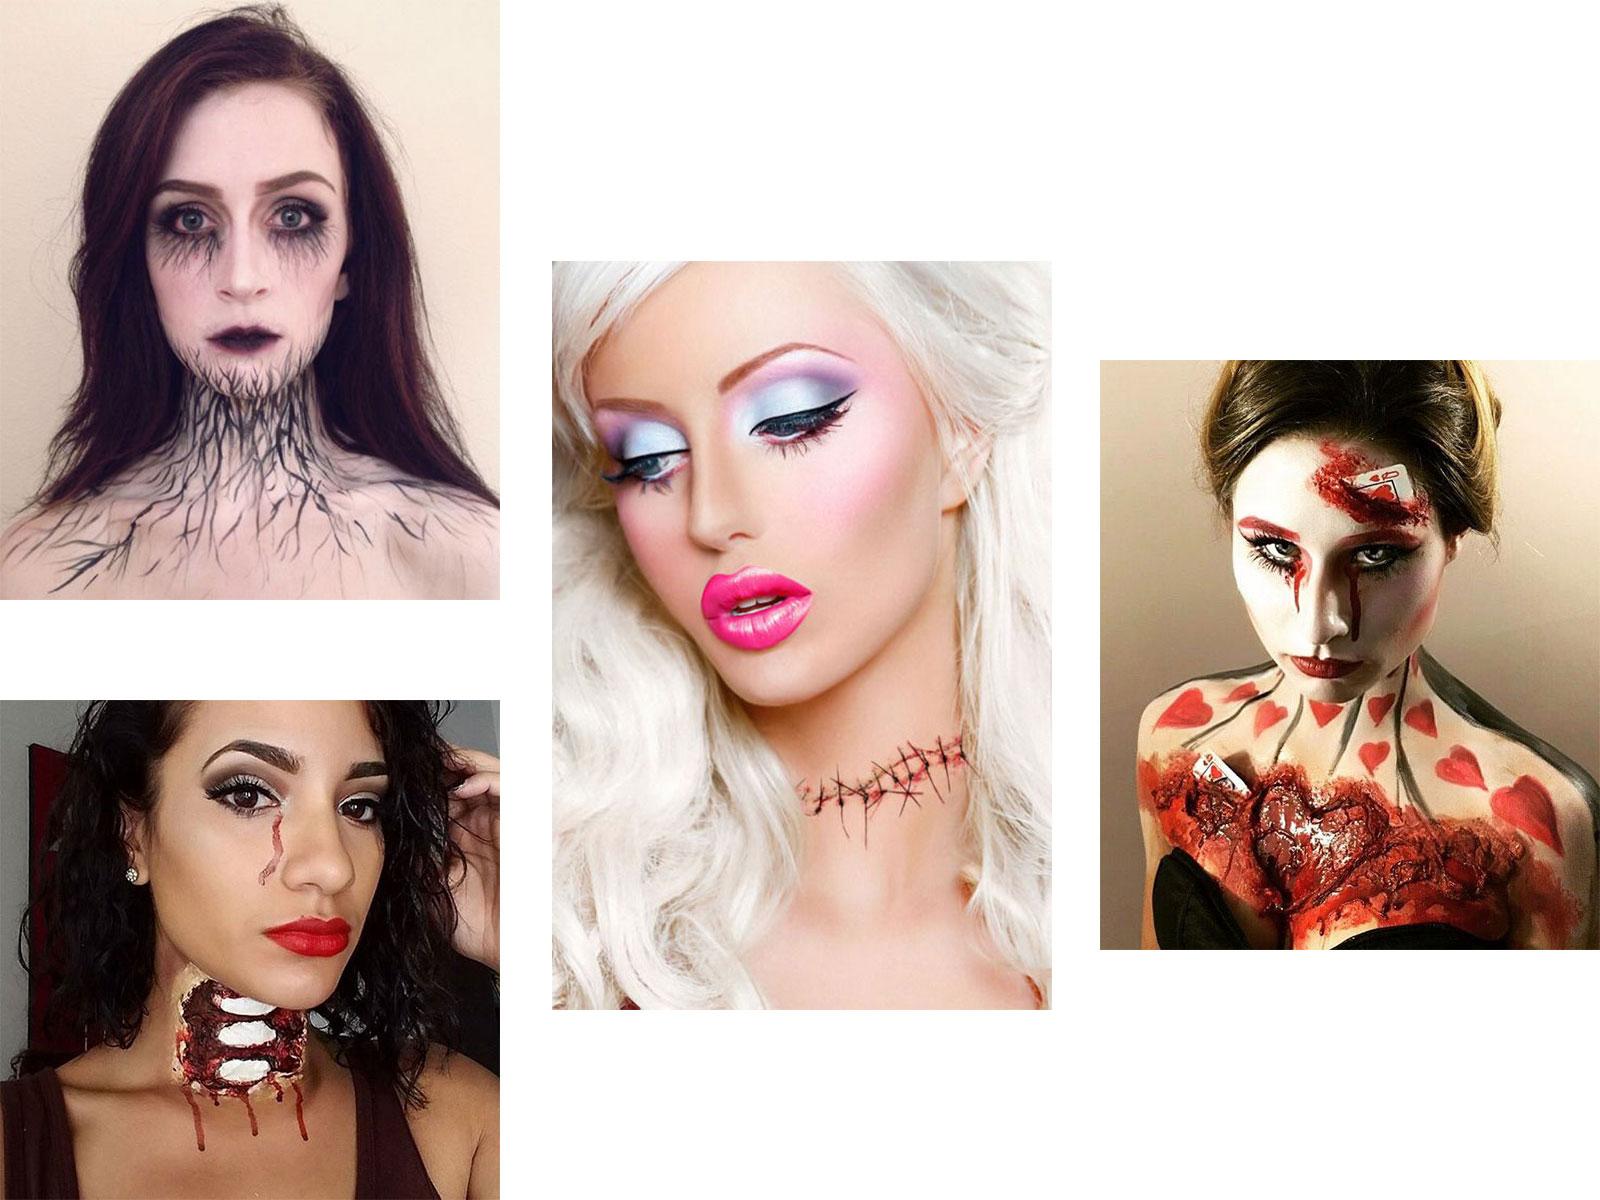 20-Very-Scary-Halloween-Neck-Makeup-Looks-Styles-Ideas-2019-F